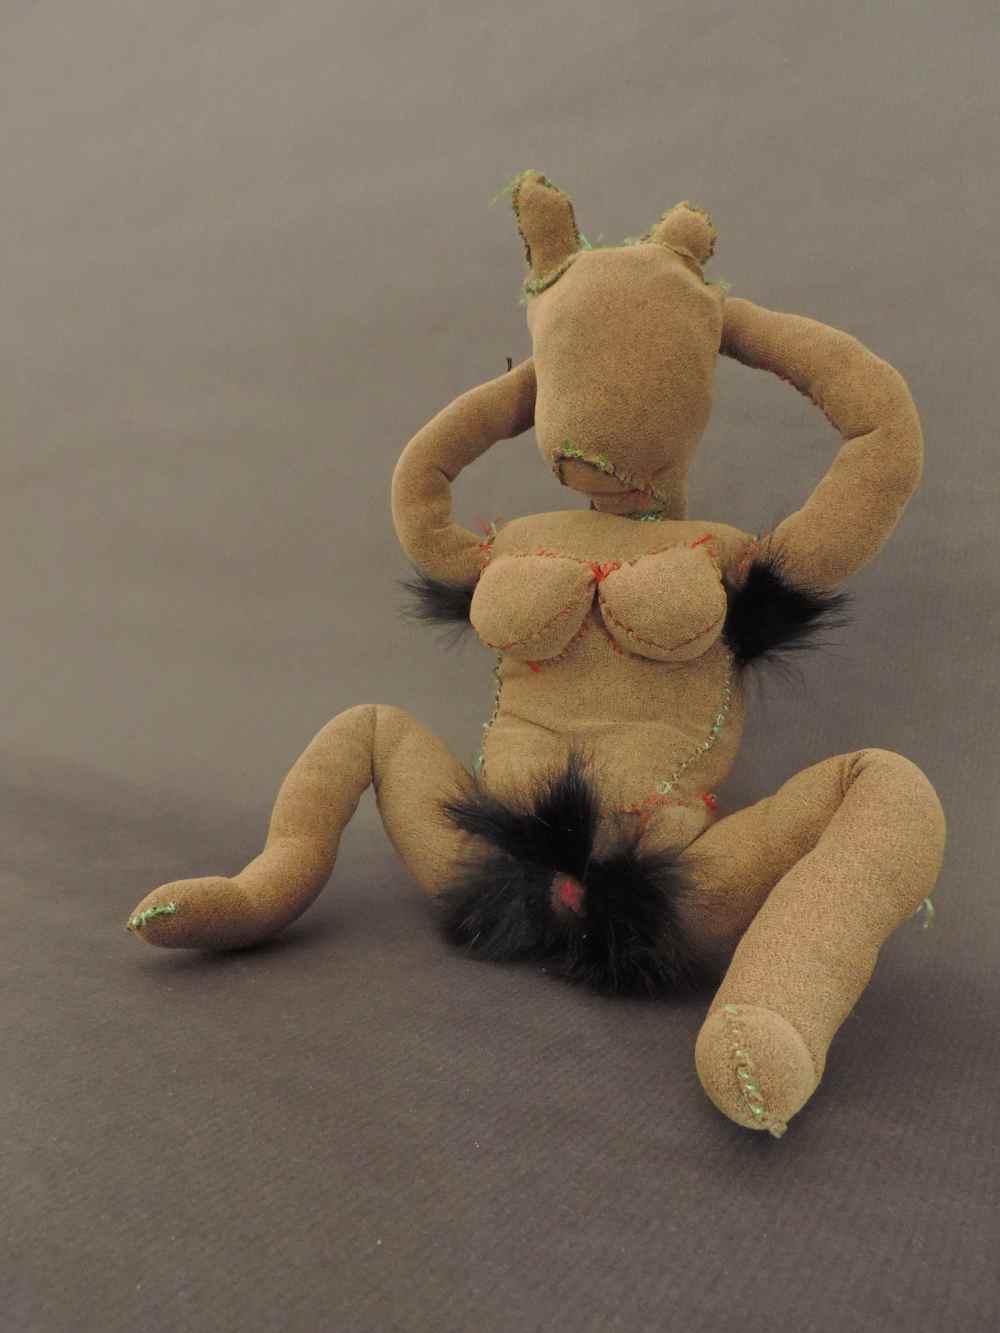 CAROL SOLAR Nº 3 de la serie Pervertis Do it yourself-Escultura textil-24x14x16cm-2014